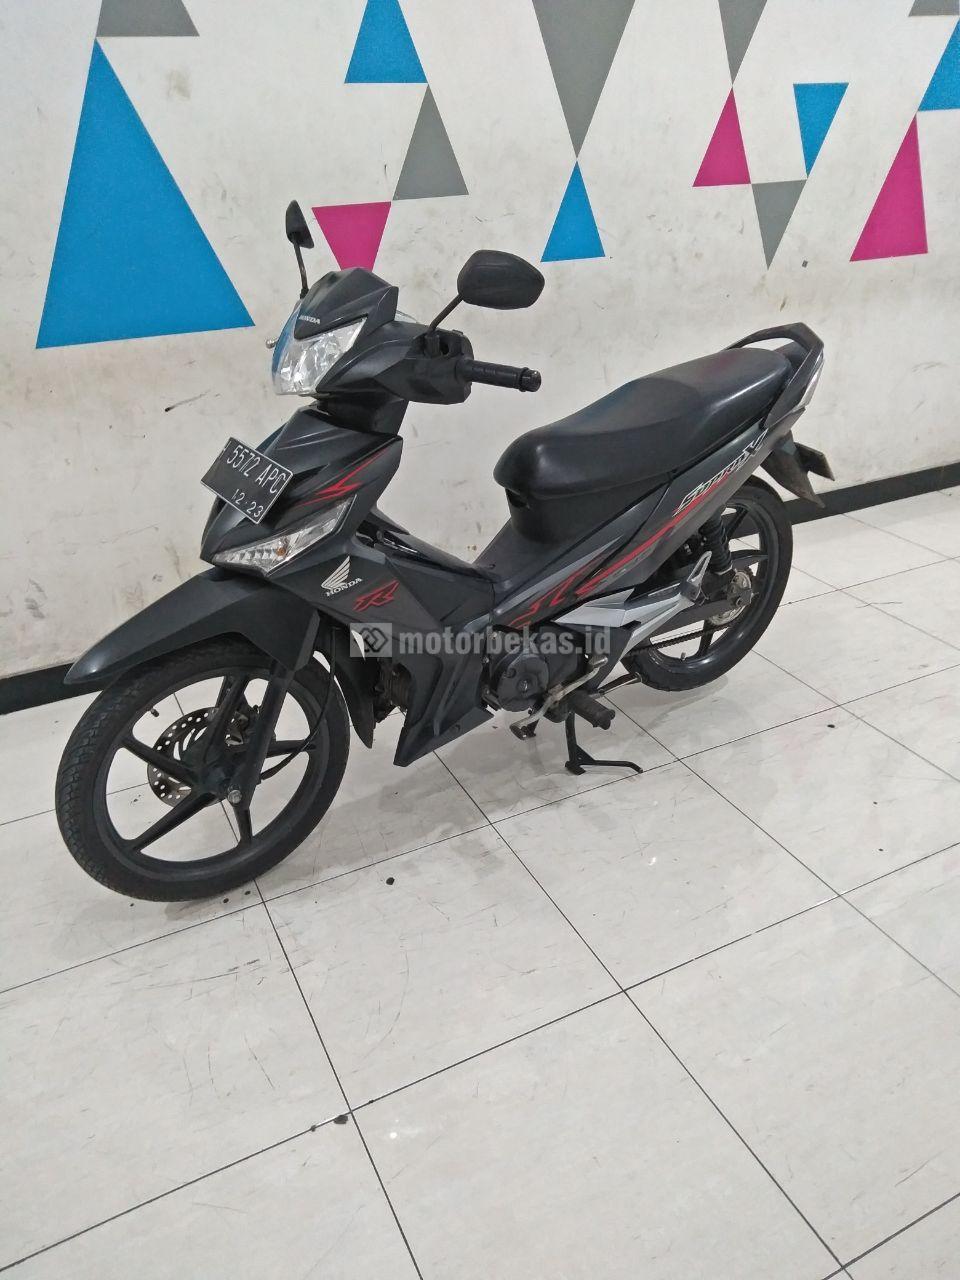 HONDA SUPRA X 125D  3384 motorbekas.id